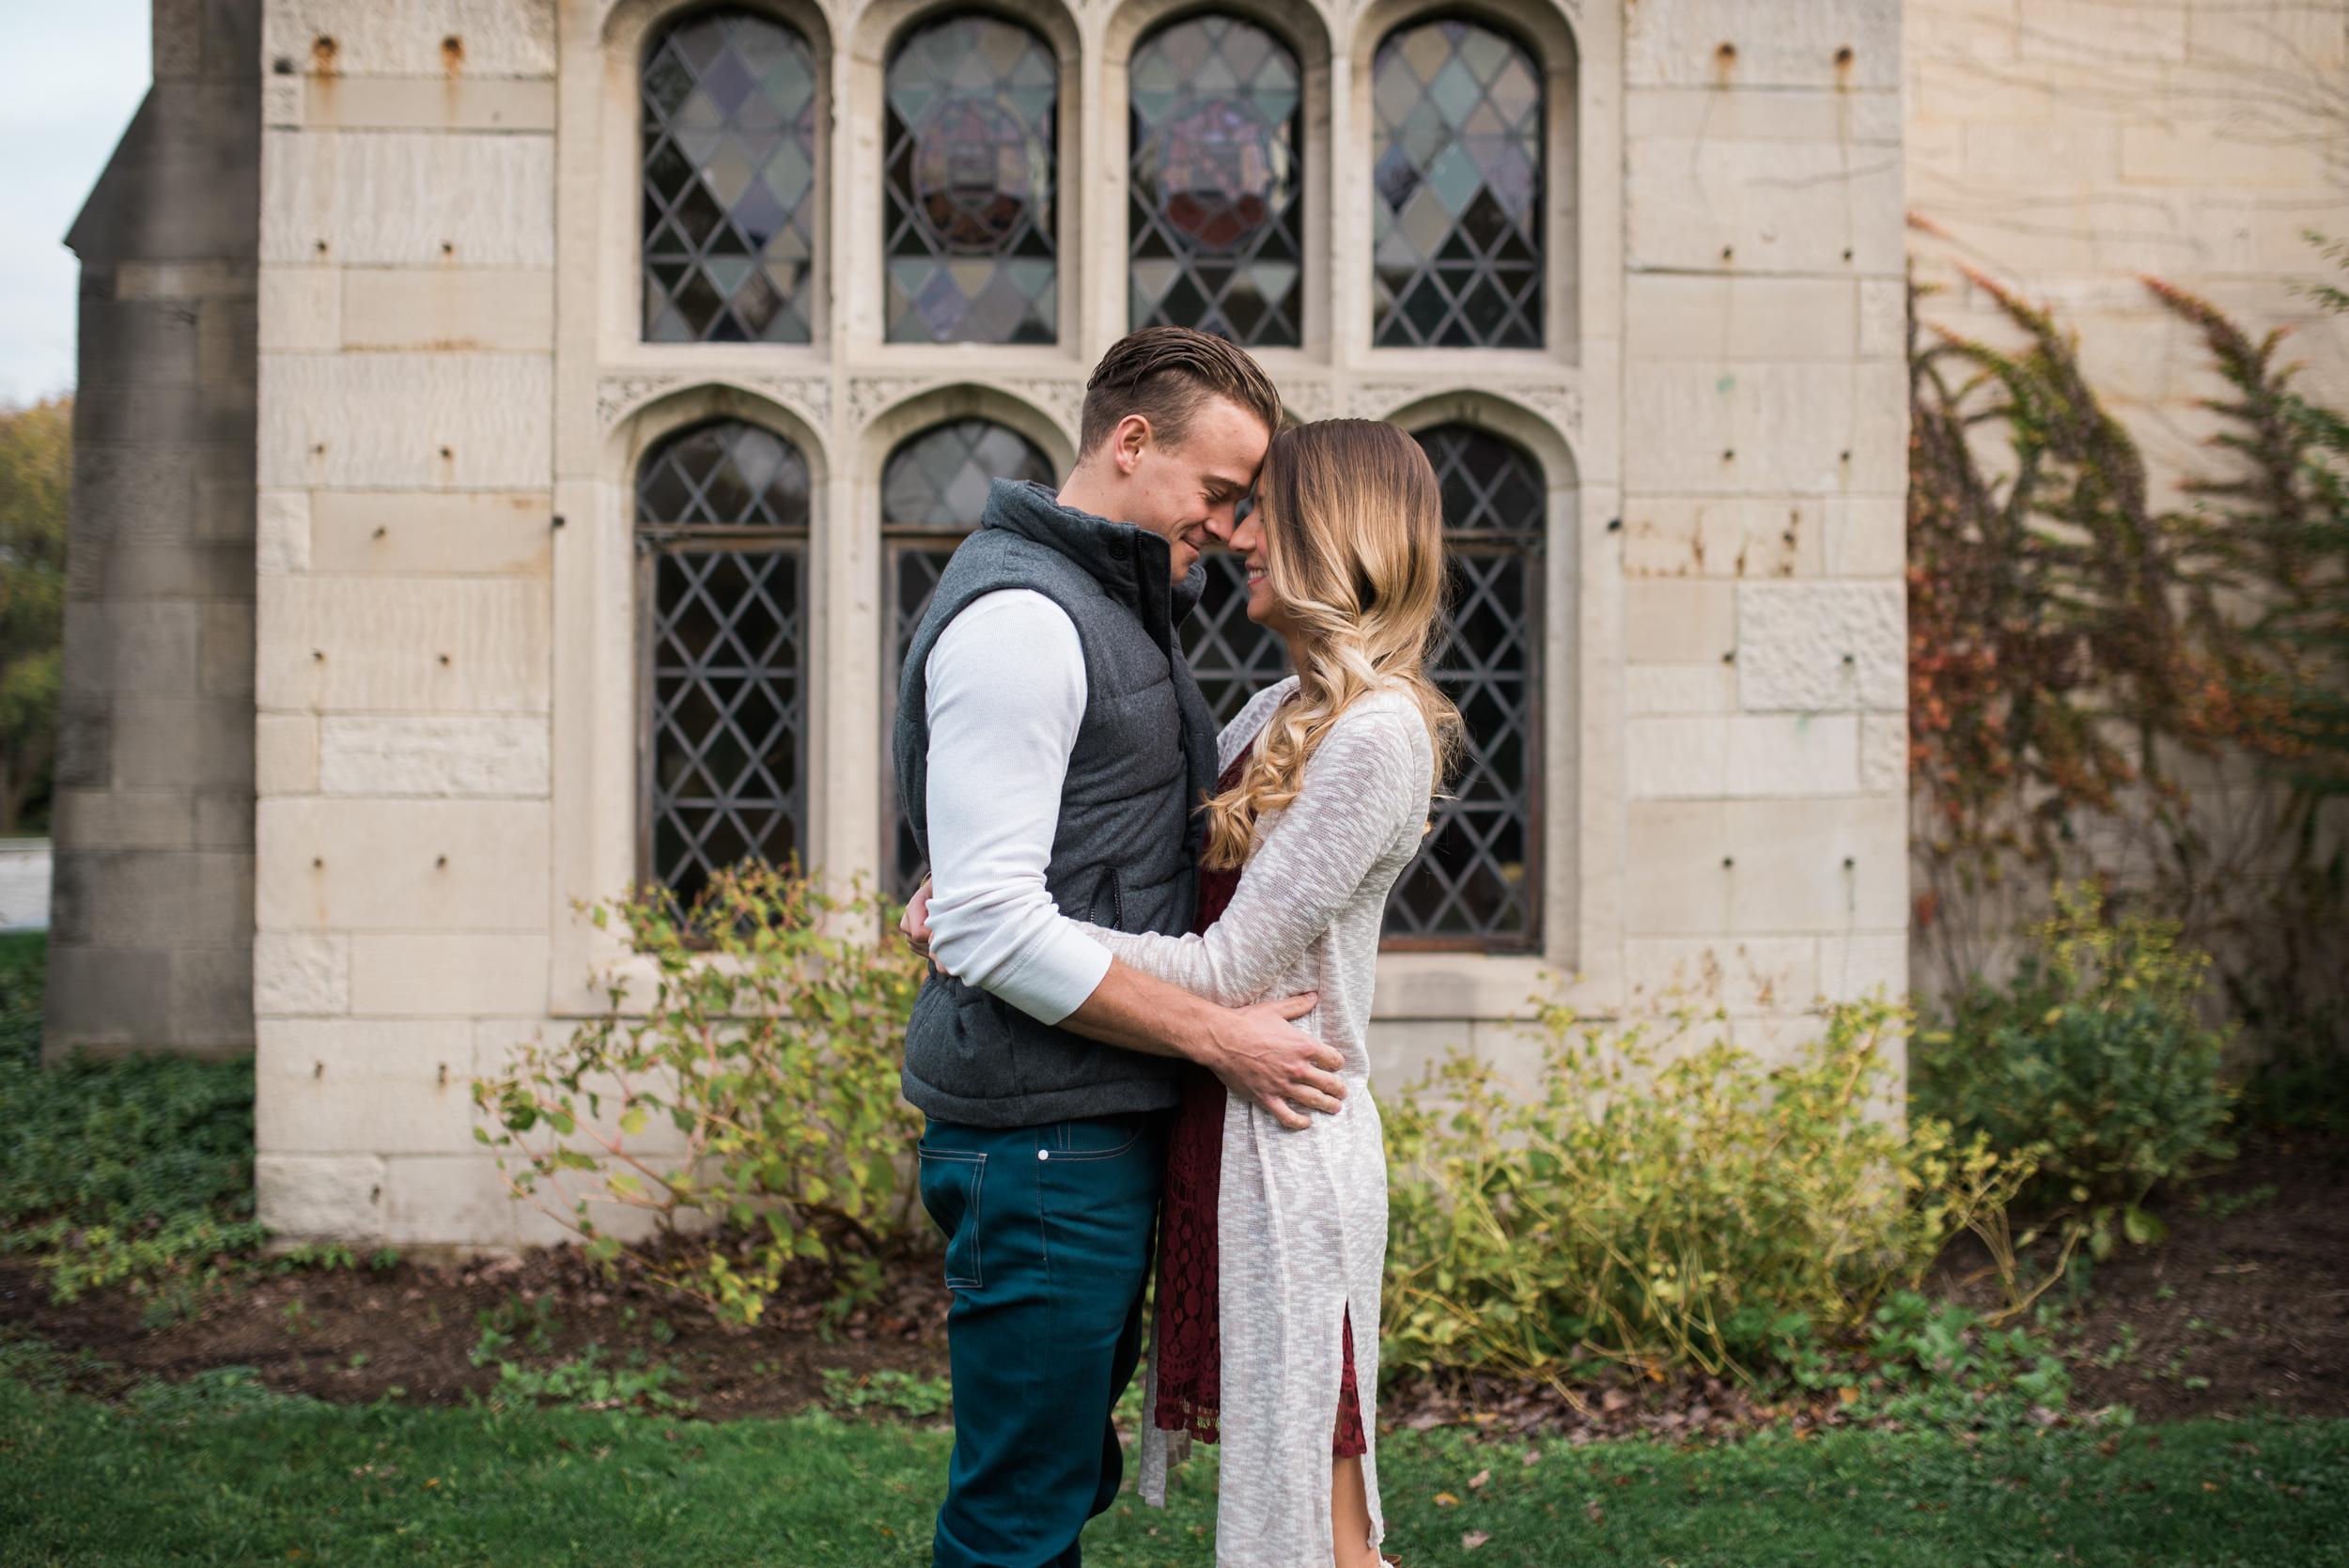 Pittsburgh engagement photographer - Pittsburgh wedding photographer - Hartwood Acres Image 1